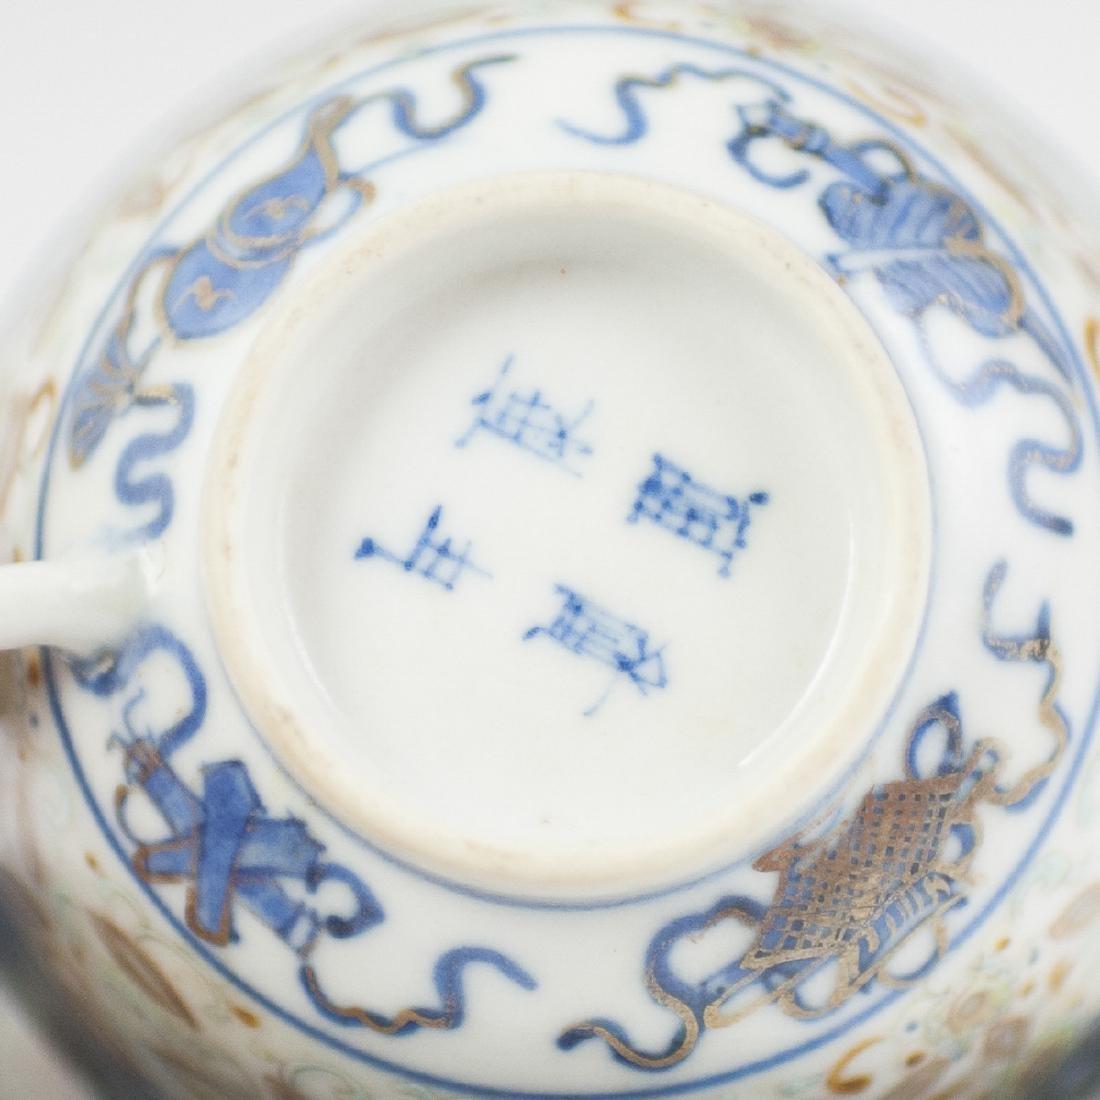 Chinese Porcelain De Riz Ware Demitasse Set - 3